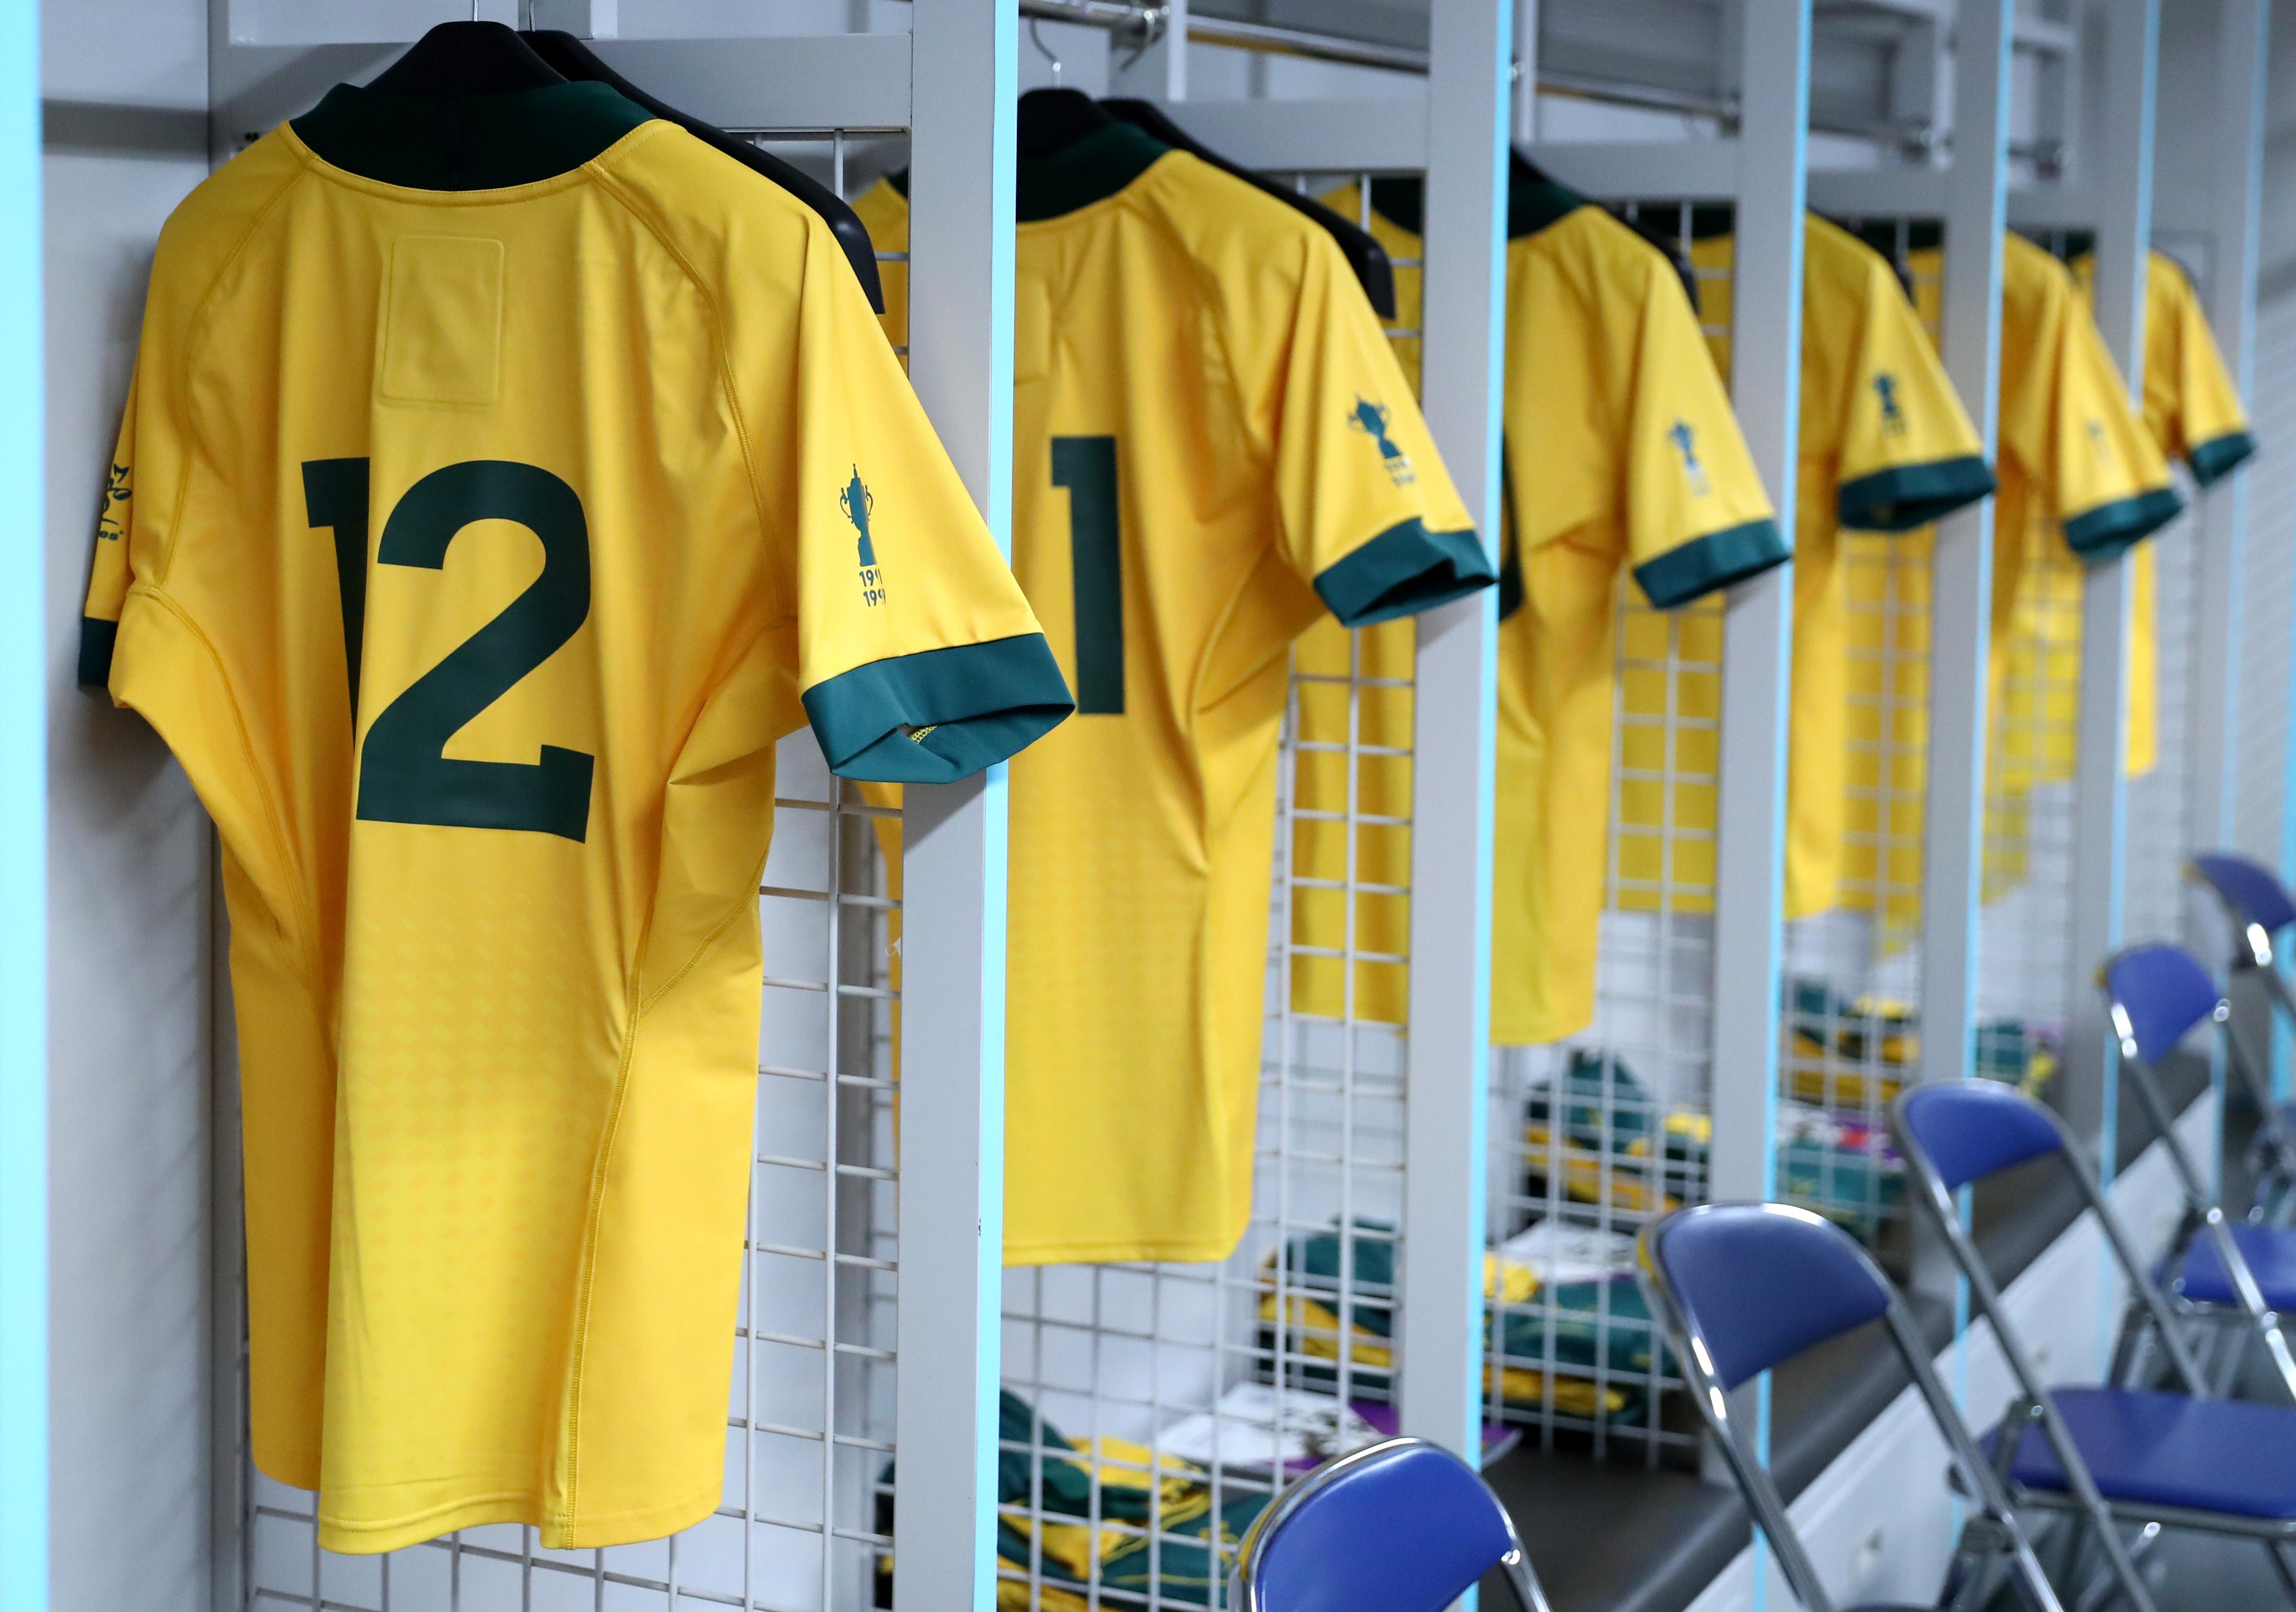 Wales v australia 2021 betting csgo betting predictions respawning